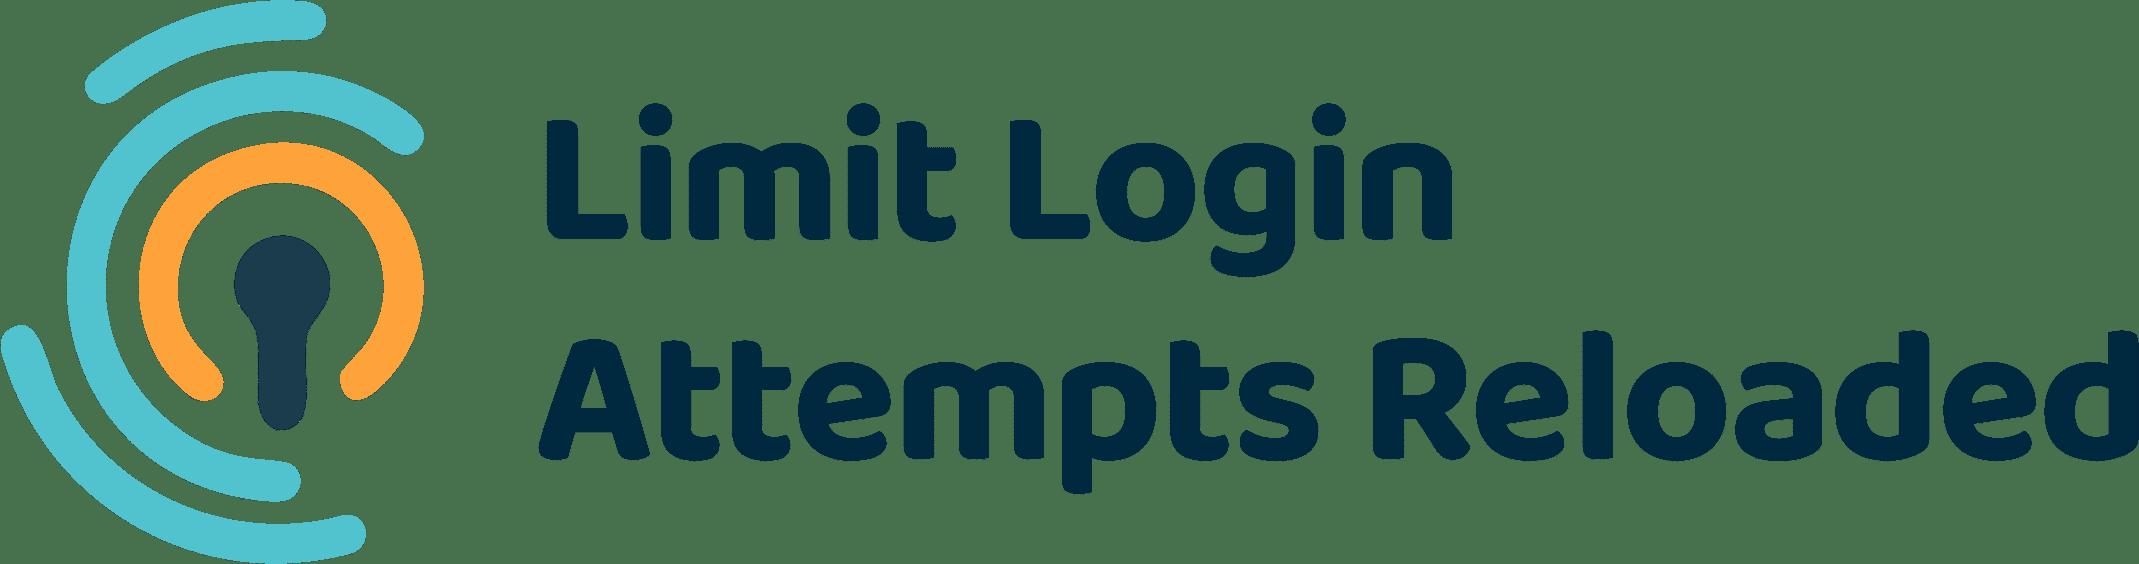 Limit Login Attempts Reloaded Logo